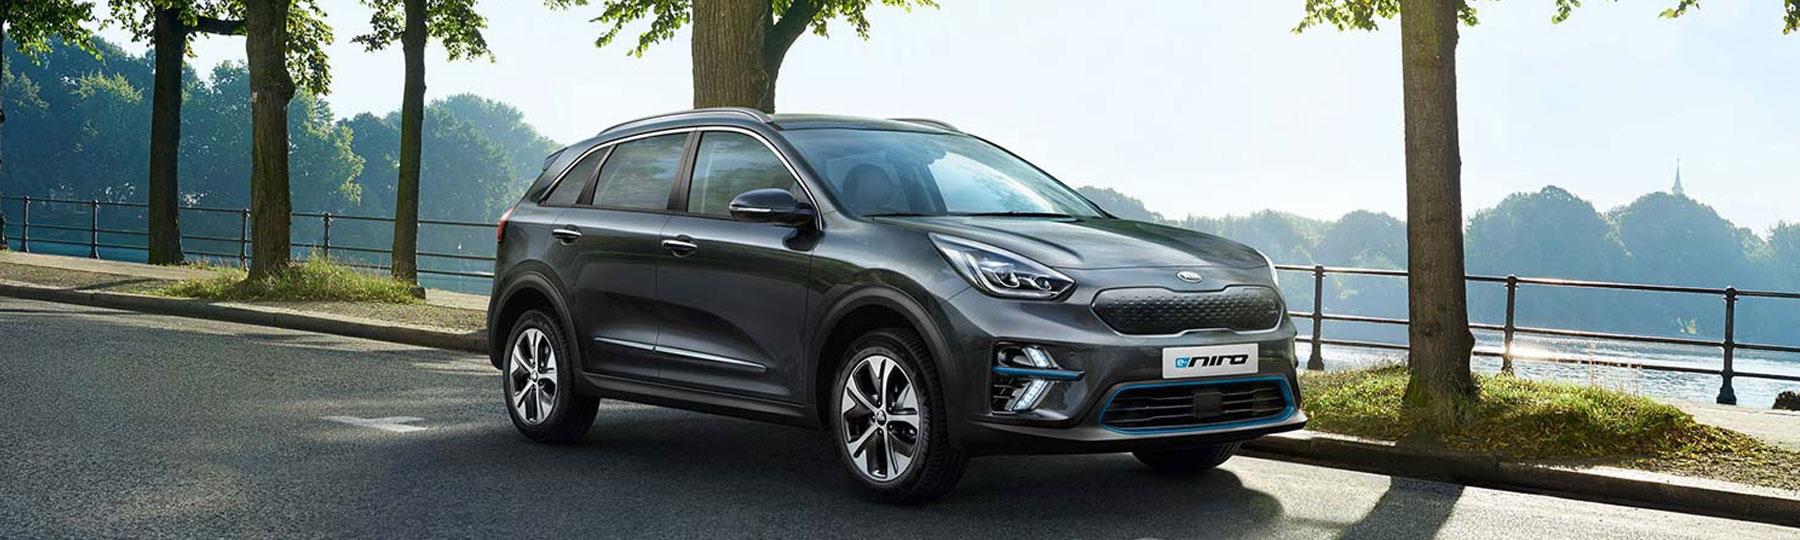 Kia e-Niro New Car Offer